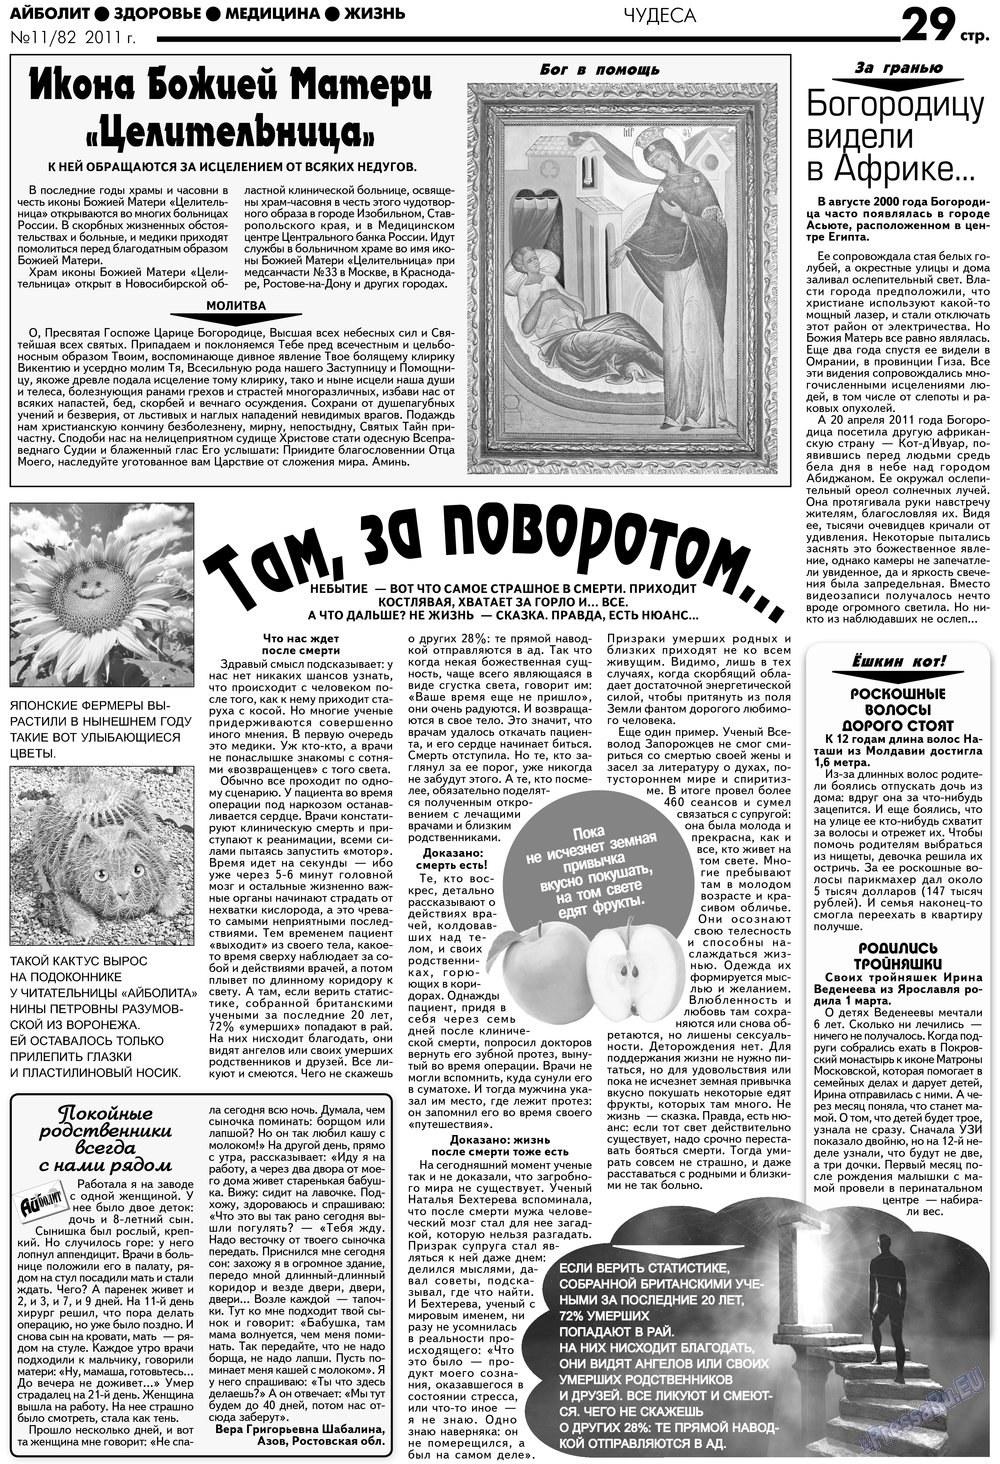 АйБолит (газета). 2012 год, номер 11, стр. 29